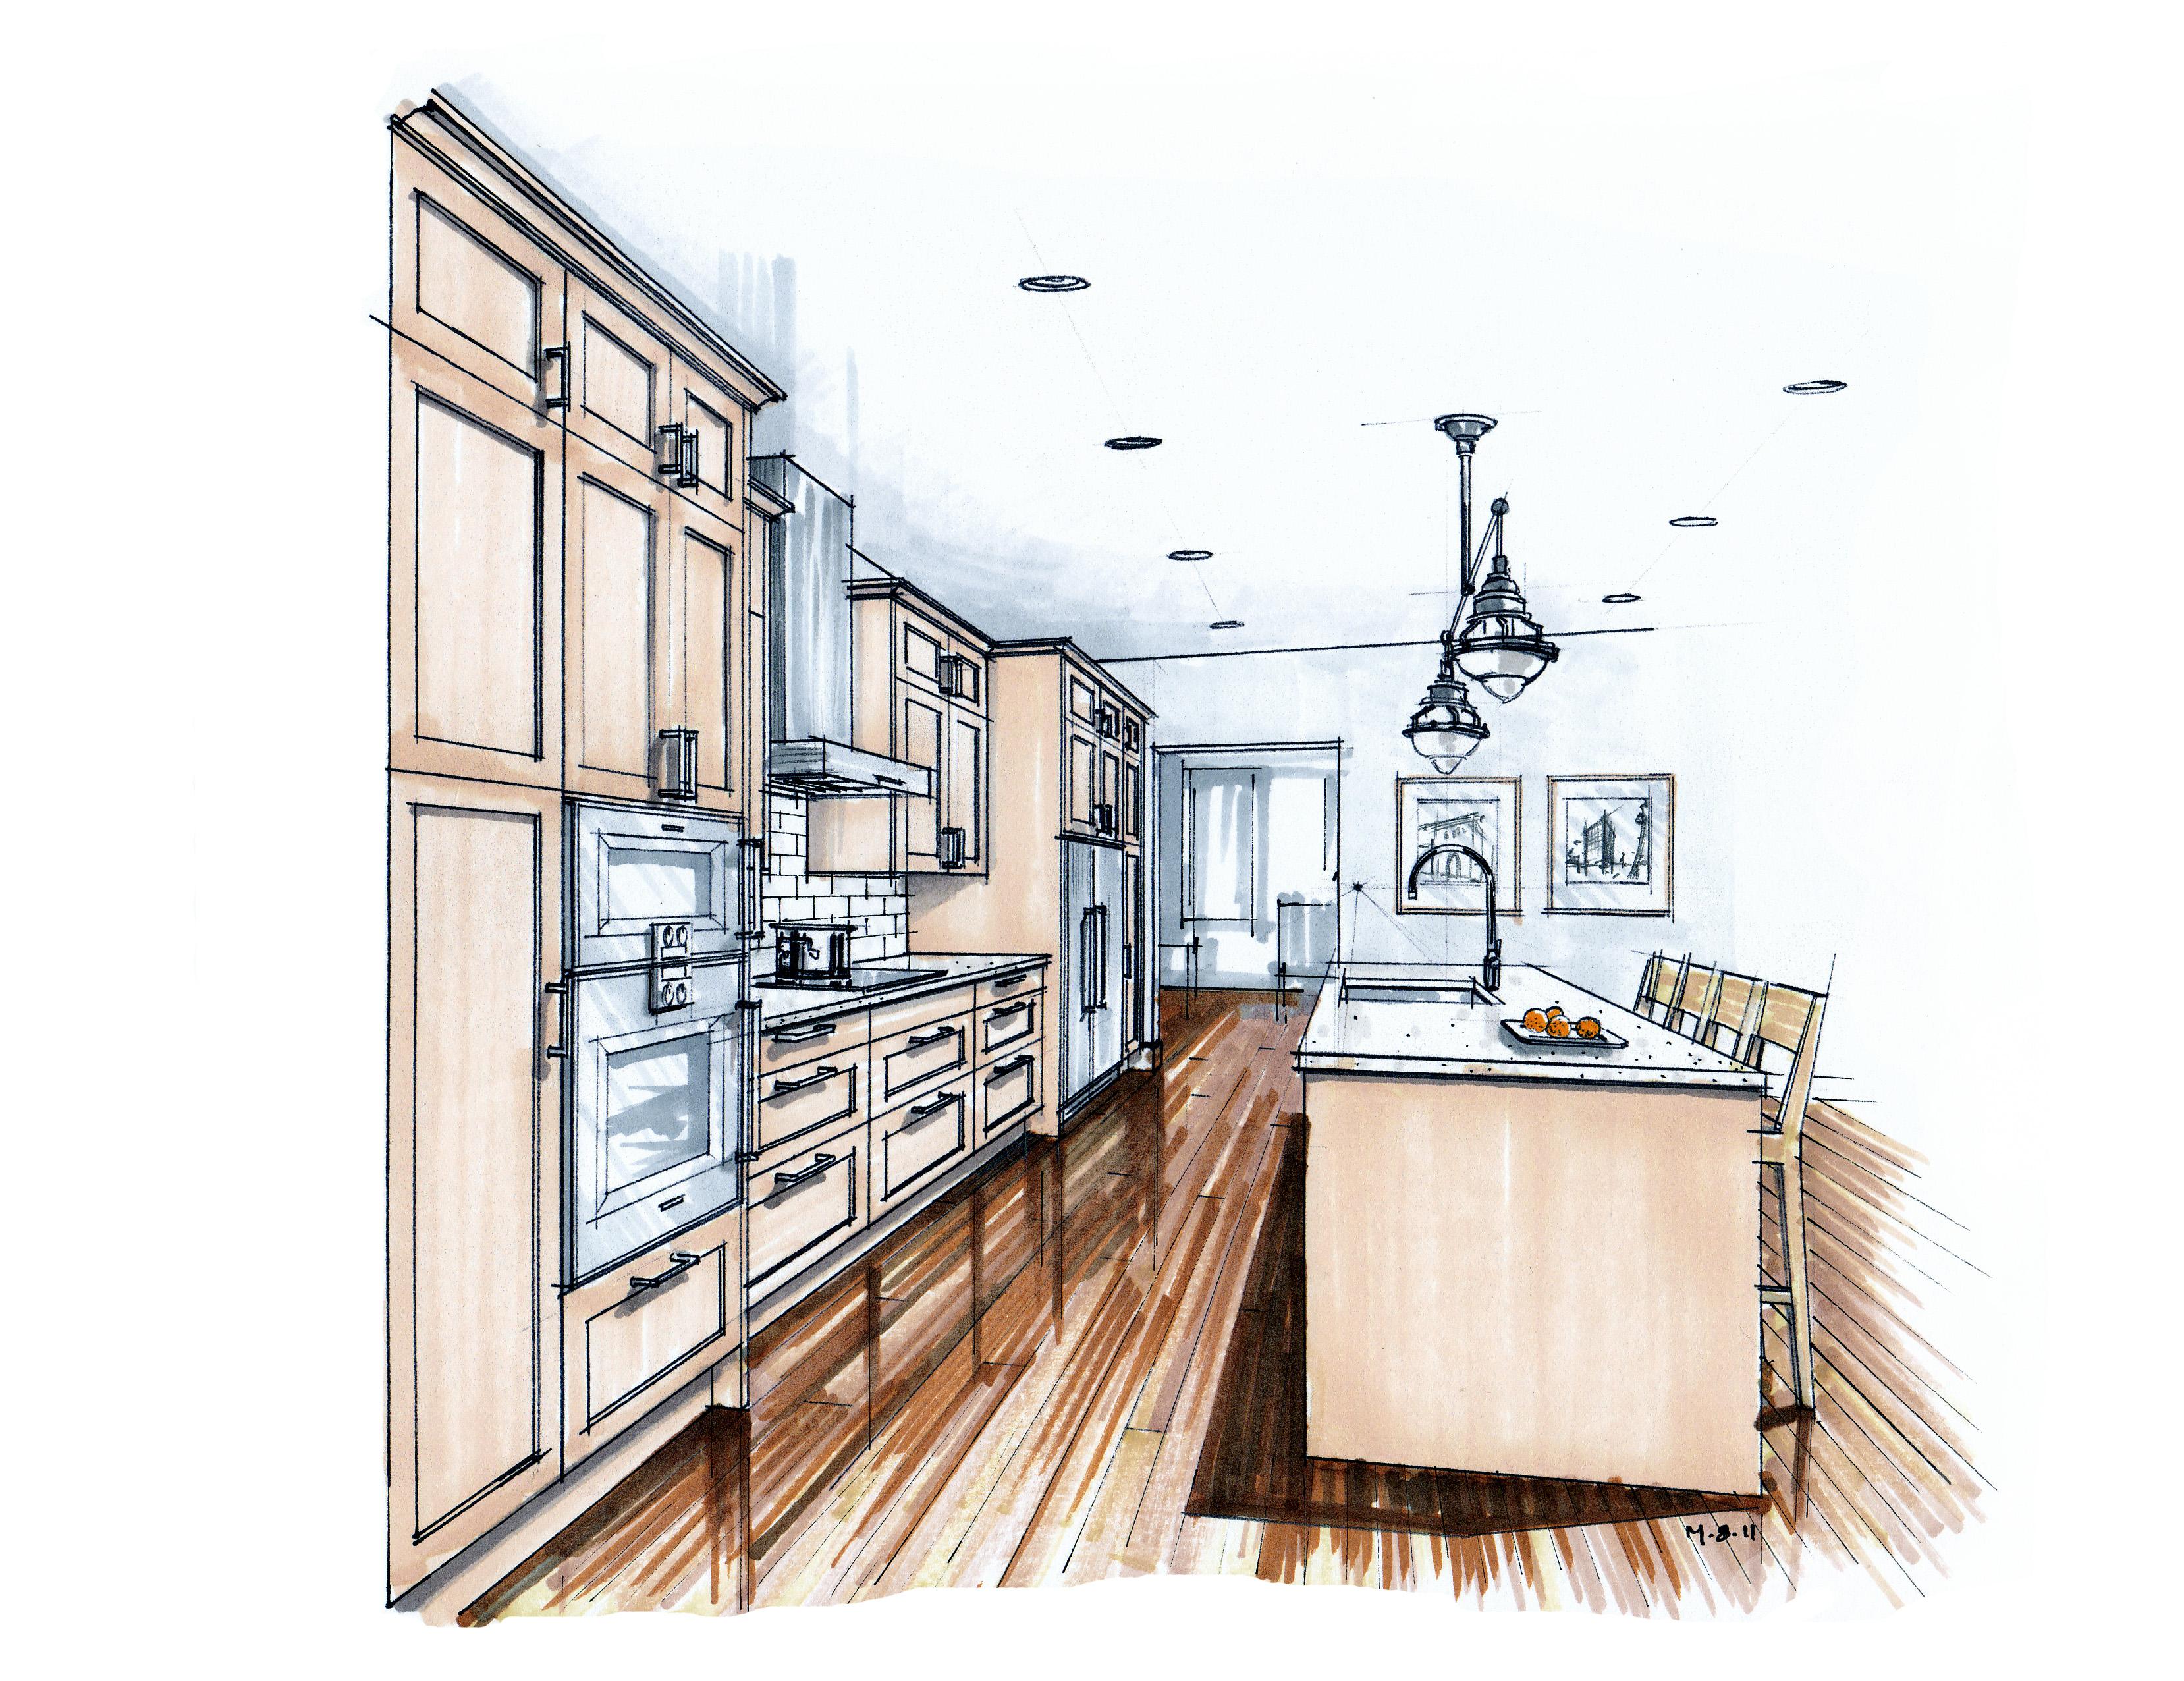 Kitchen Design  Mick Ricereto Interior  Product Design  Page 6